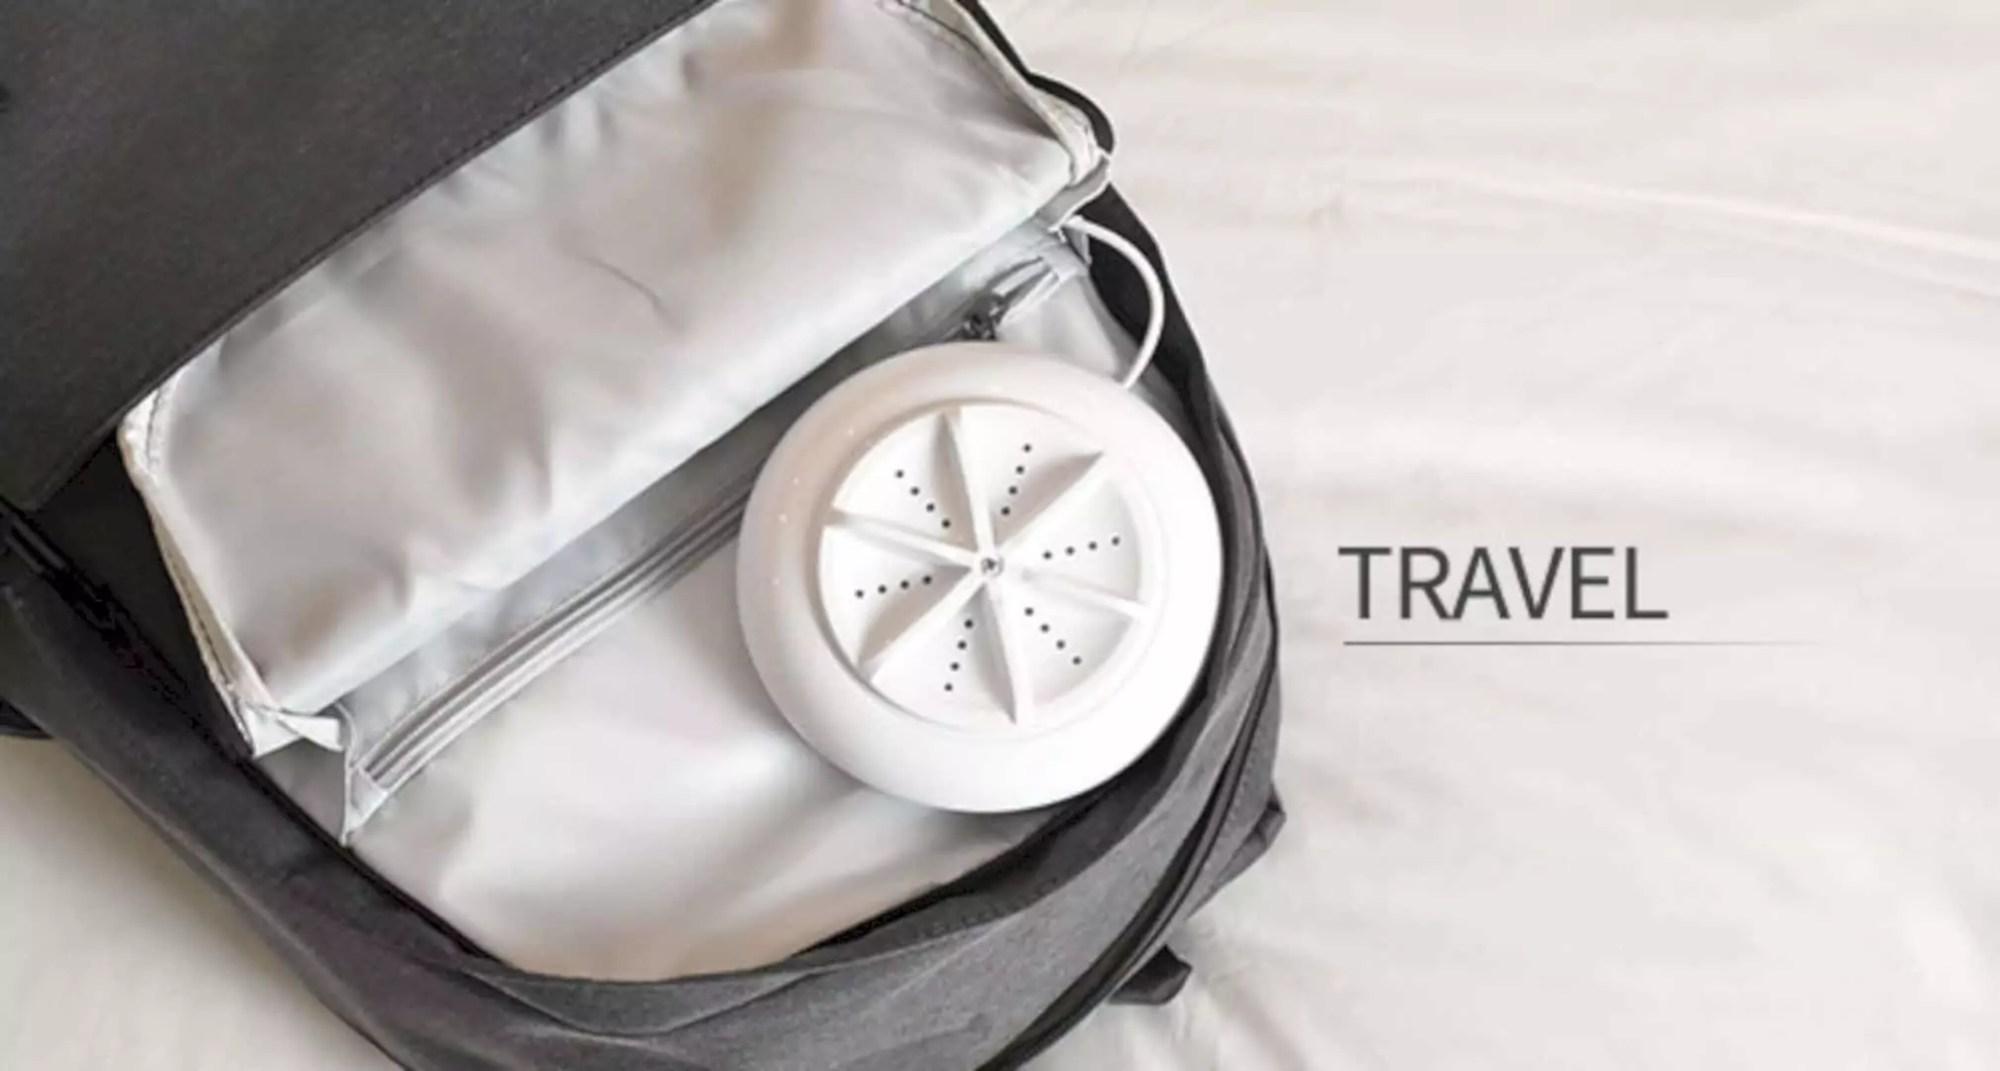 Soaclean: The Portable Ultrasonic Turbo Washing Device